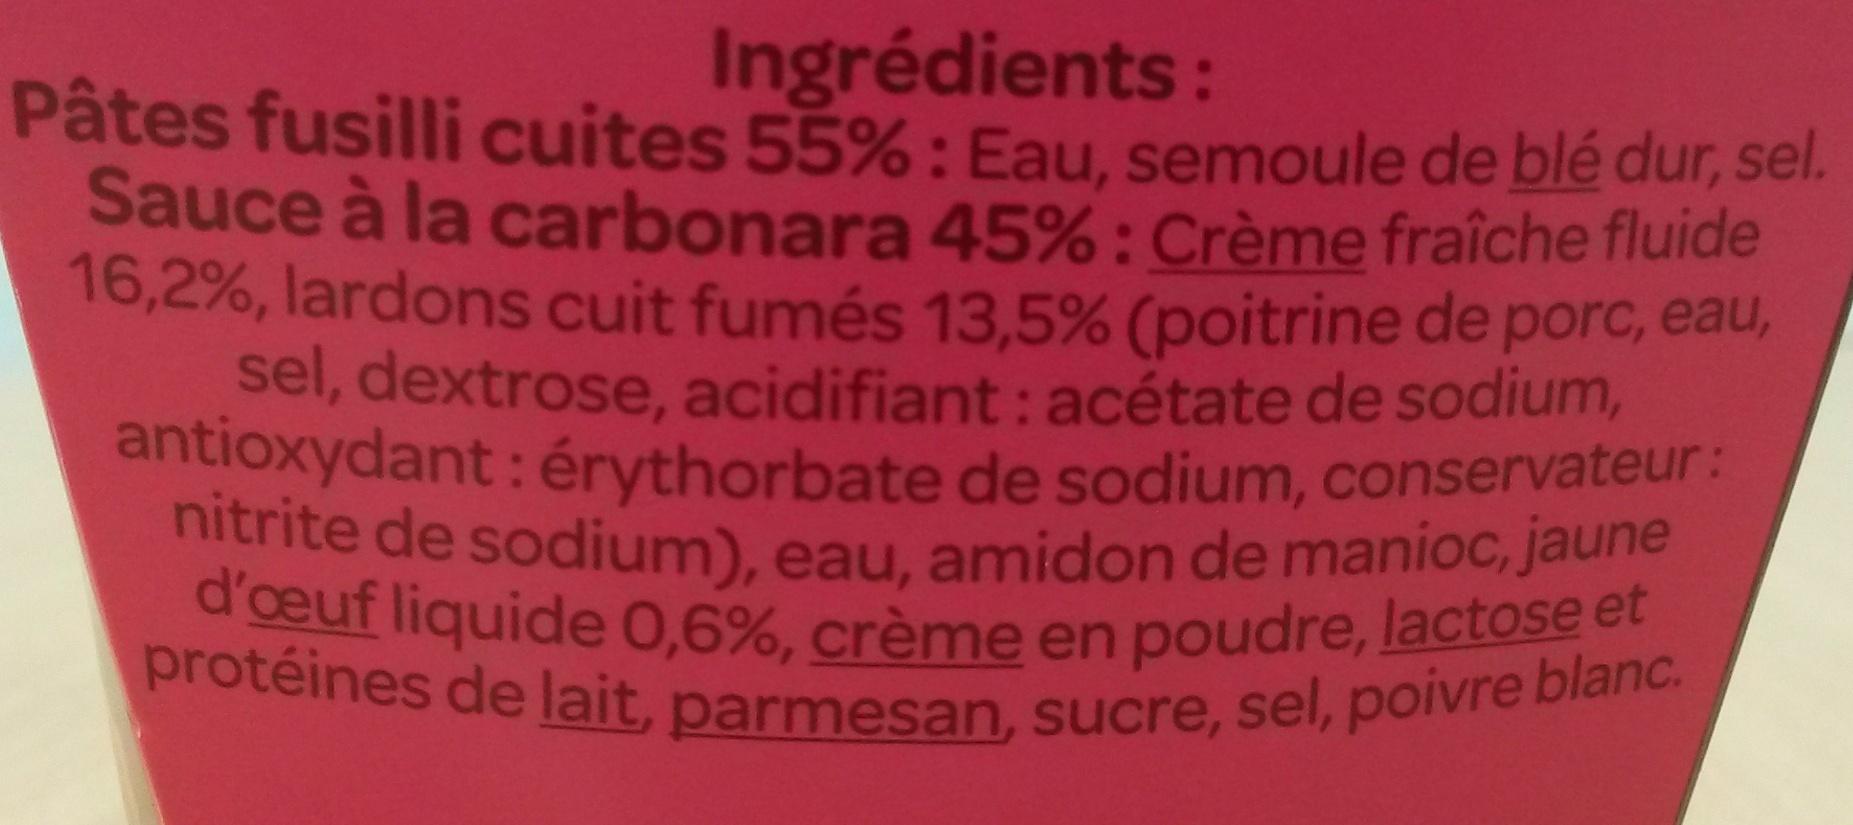 Festonate carbonara - Ingredients - fr